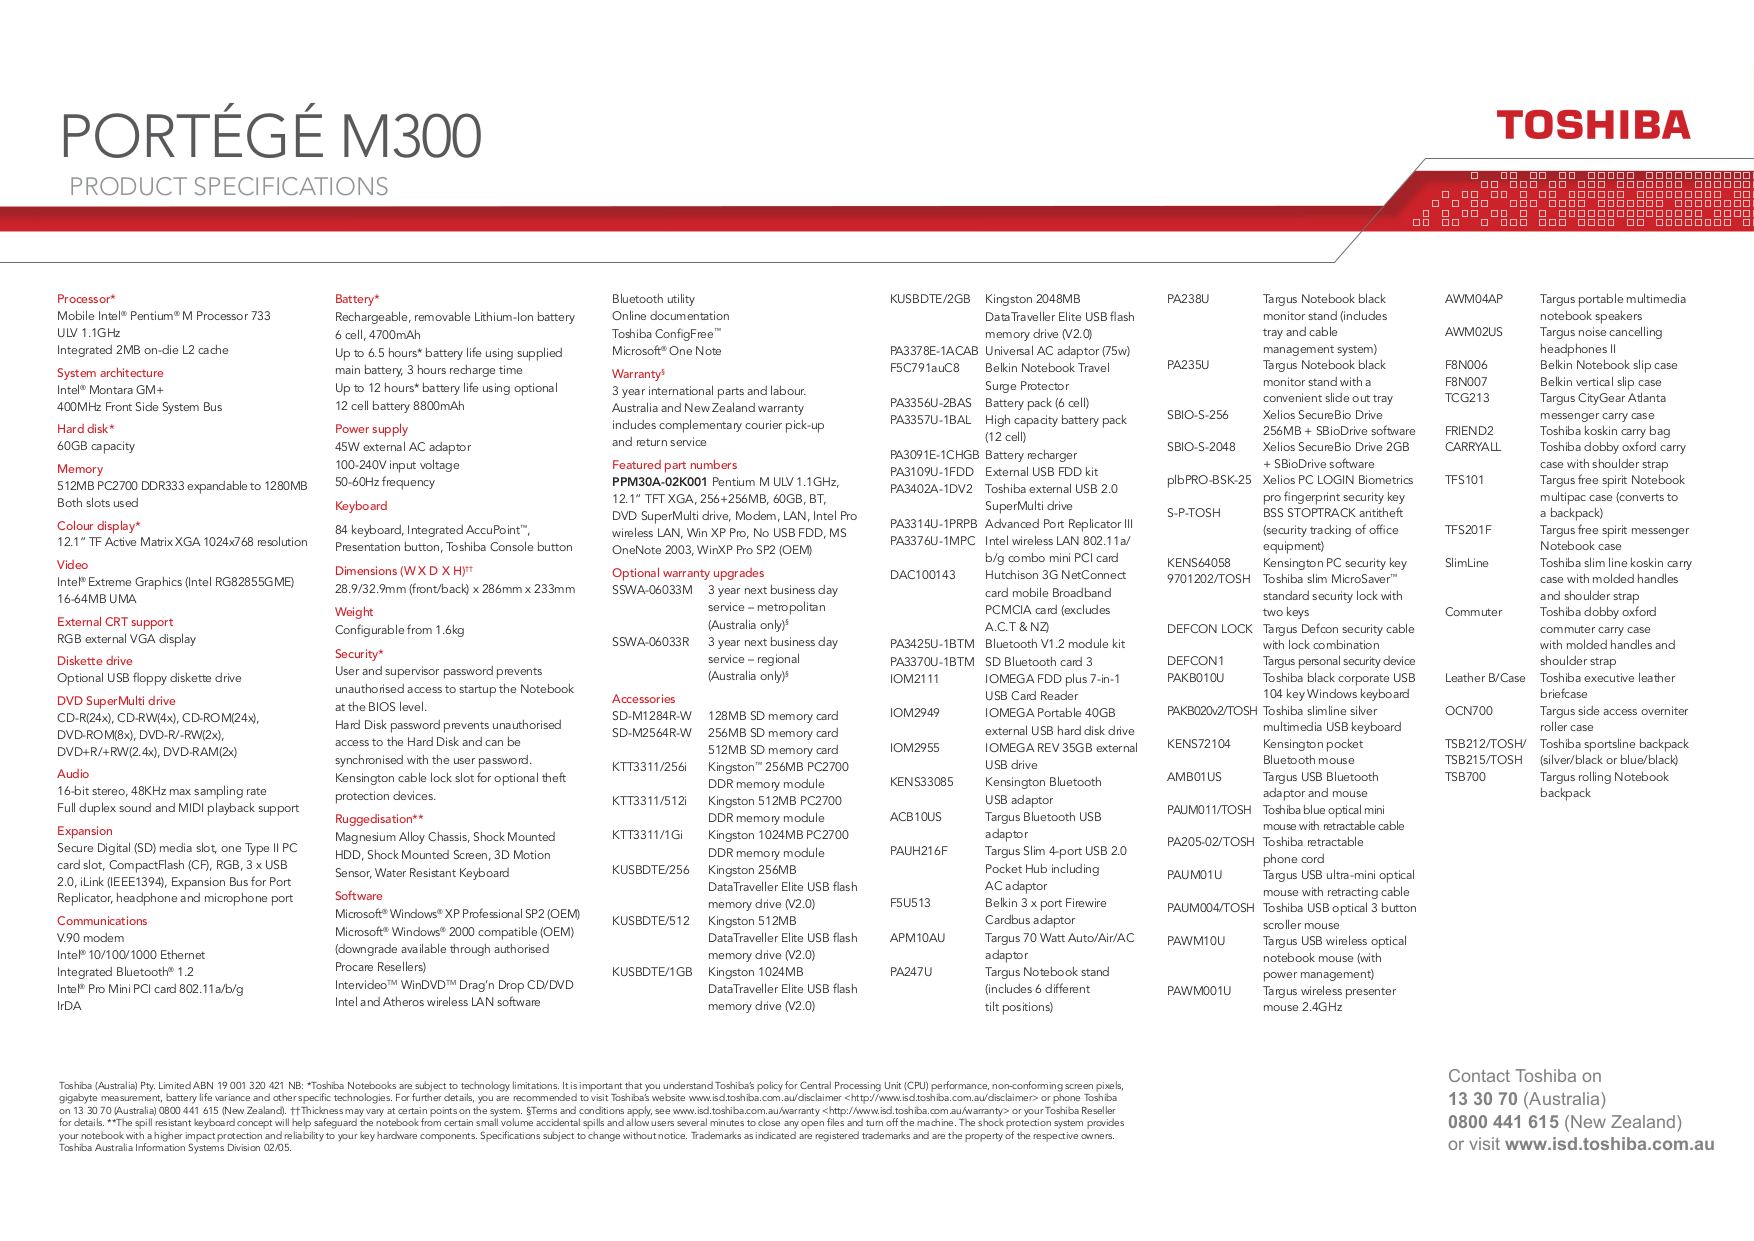 pdf for Targus Headphone AWM02US manual